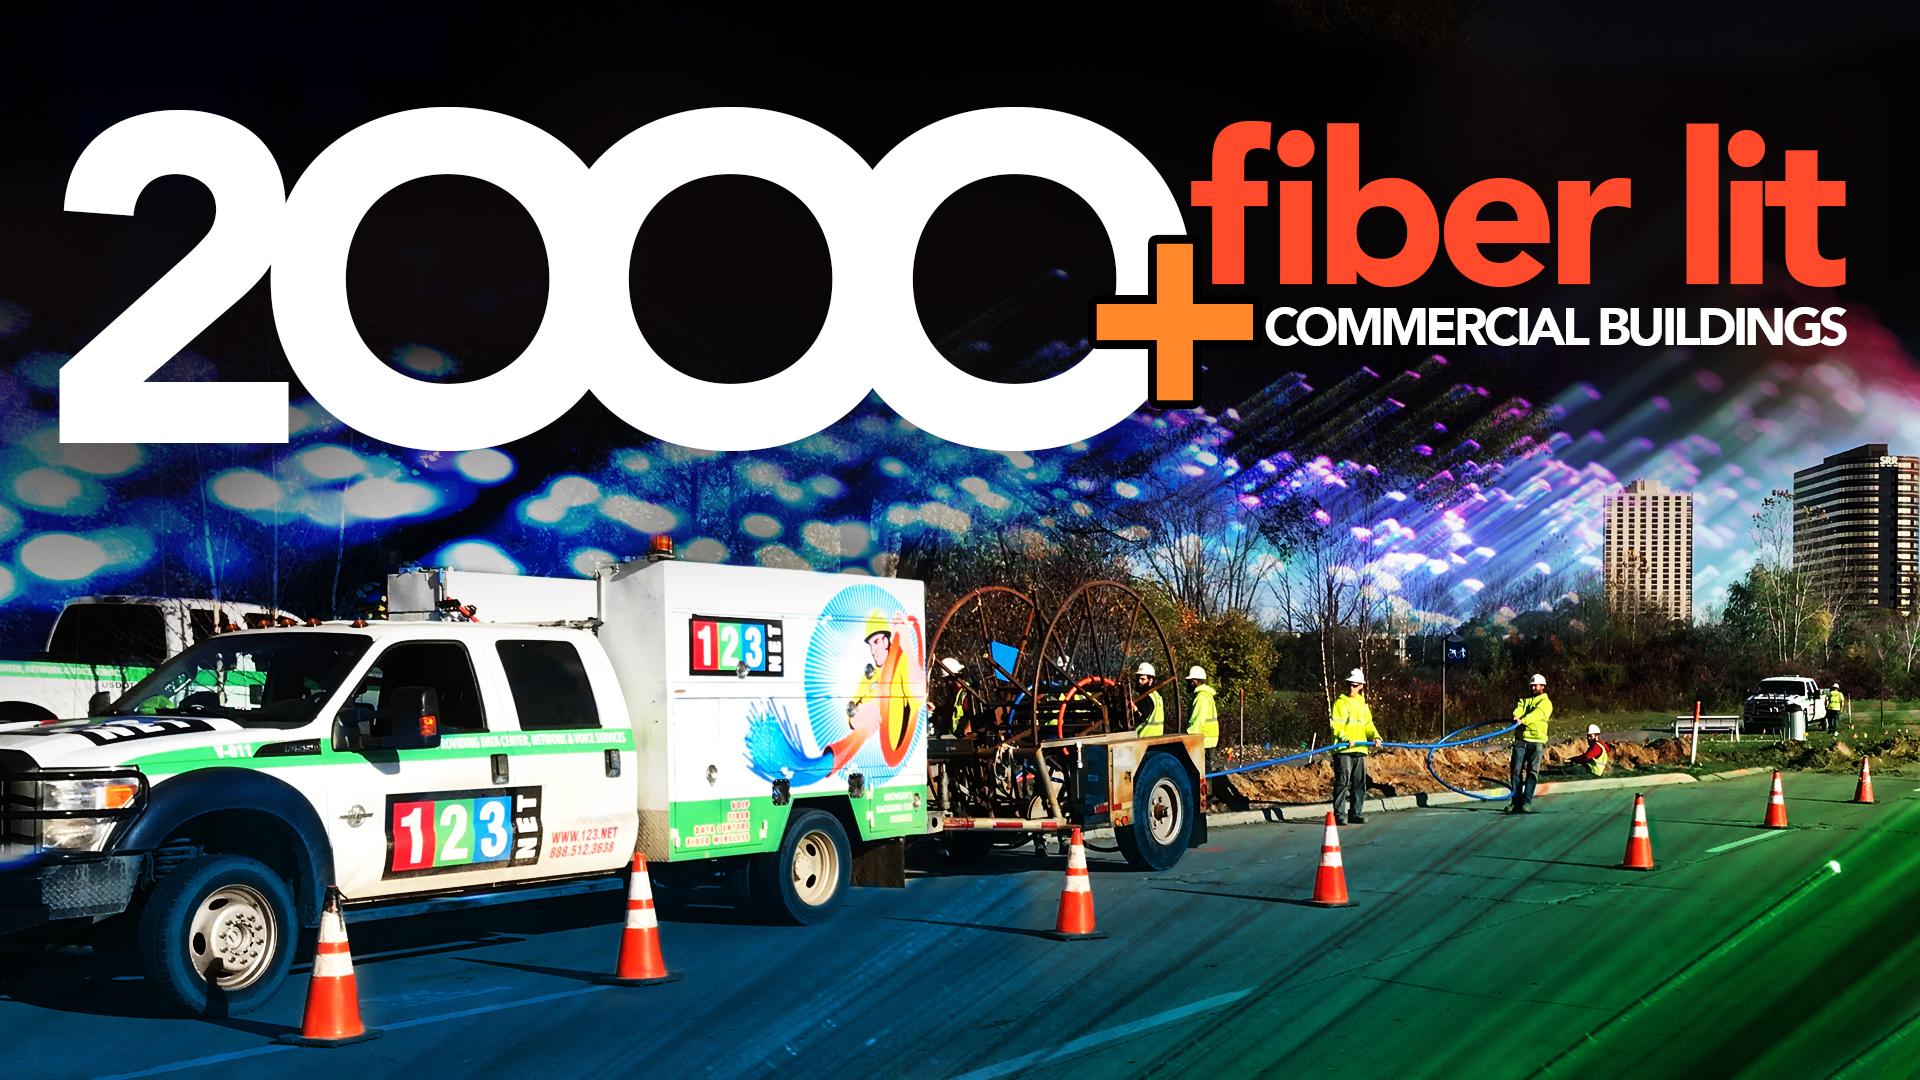 123NET Reaches the 2,000th Fiber Lit Commercial Building Milestone